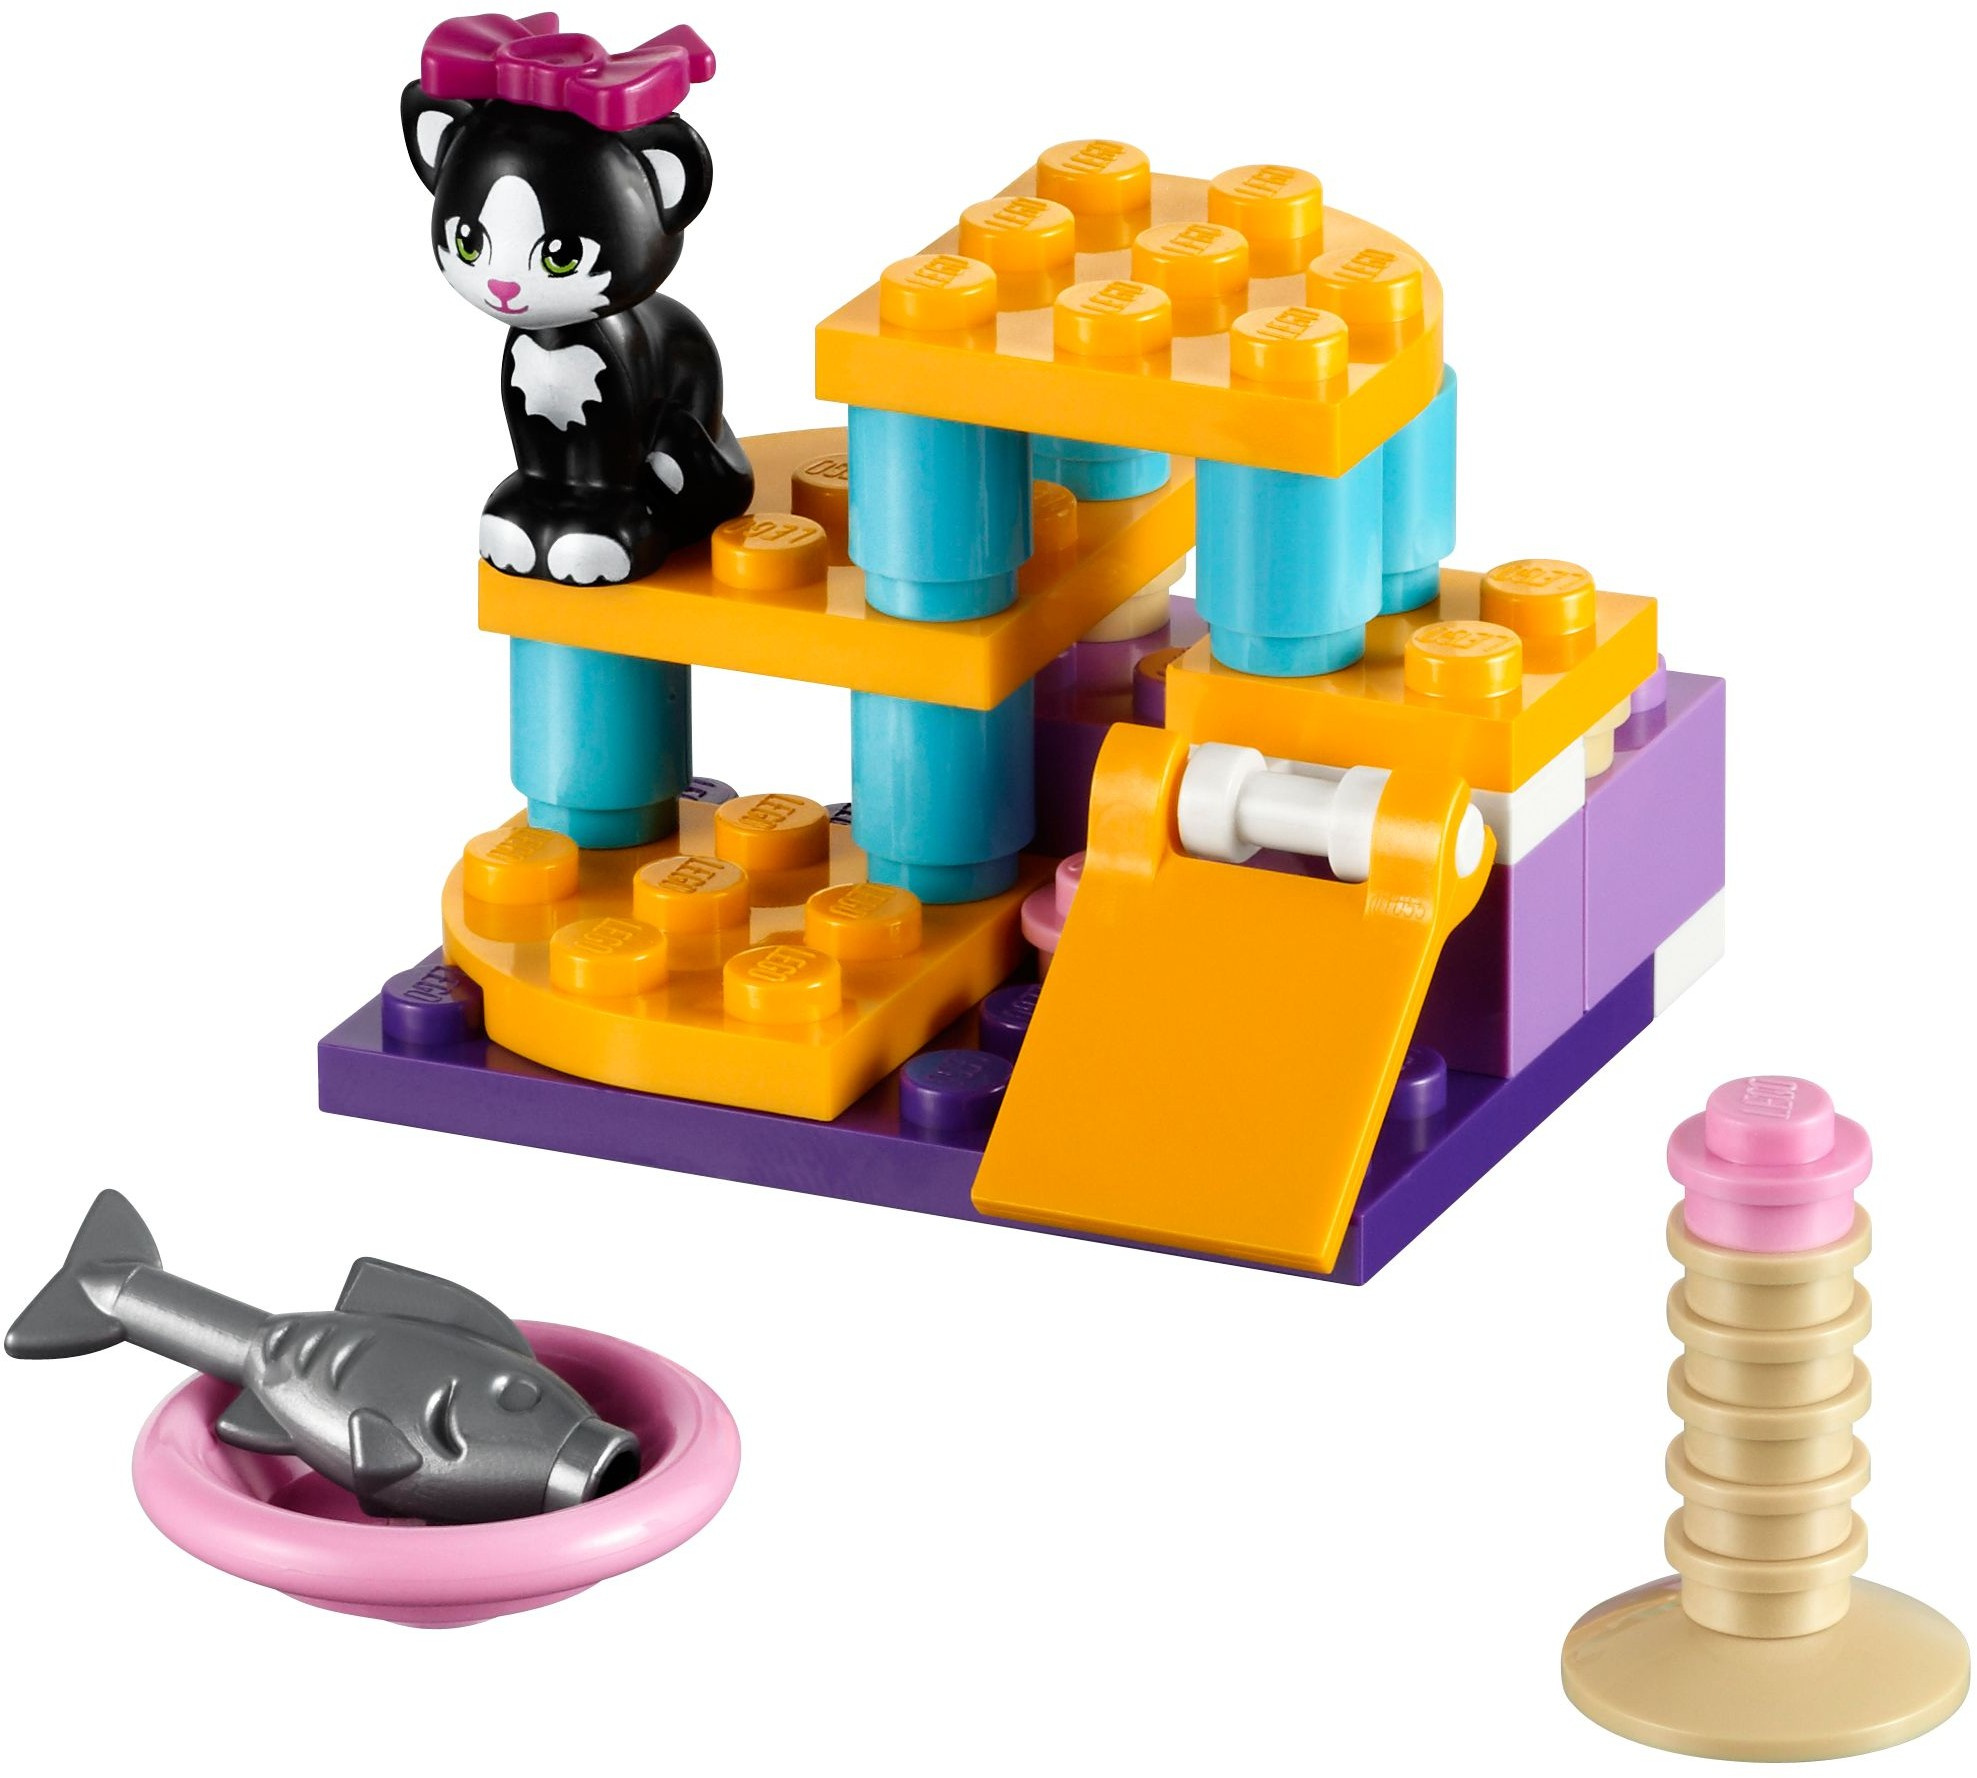 lego friends 41003 instructions